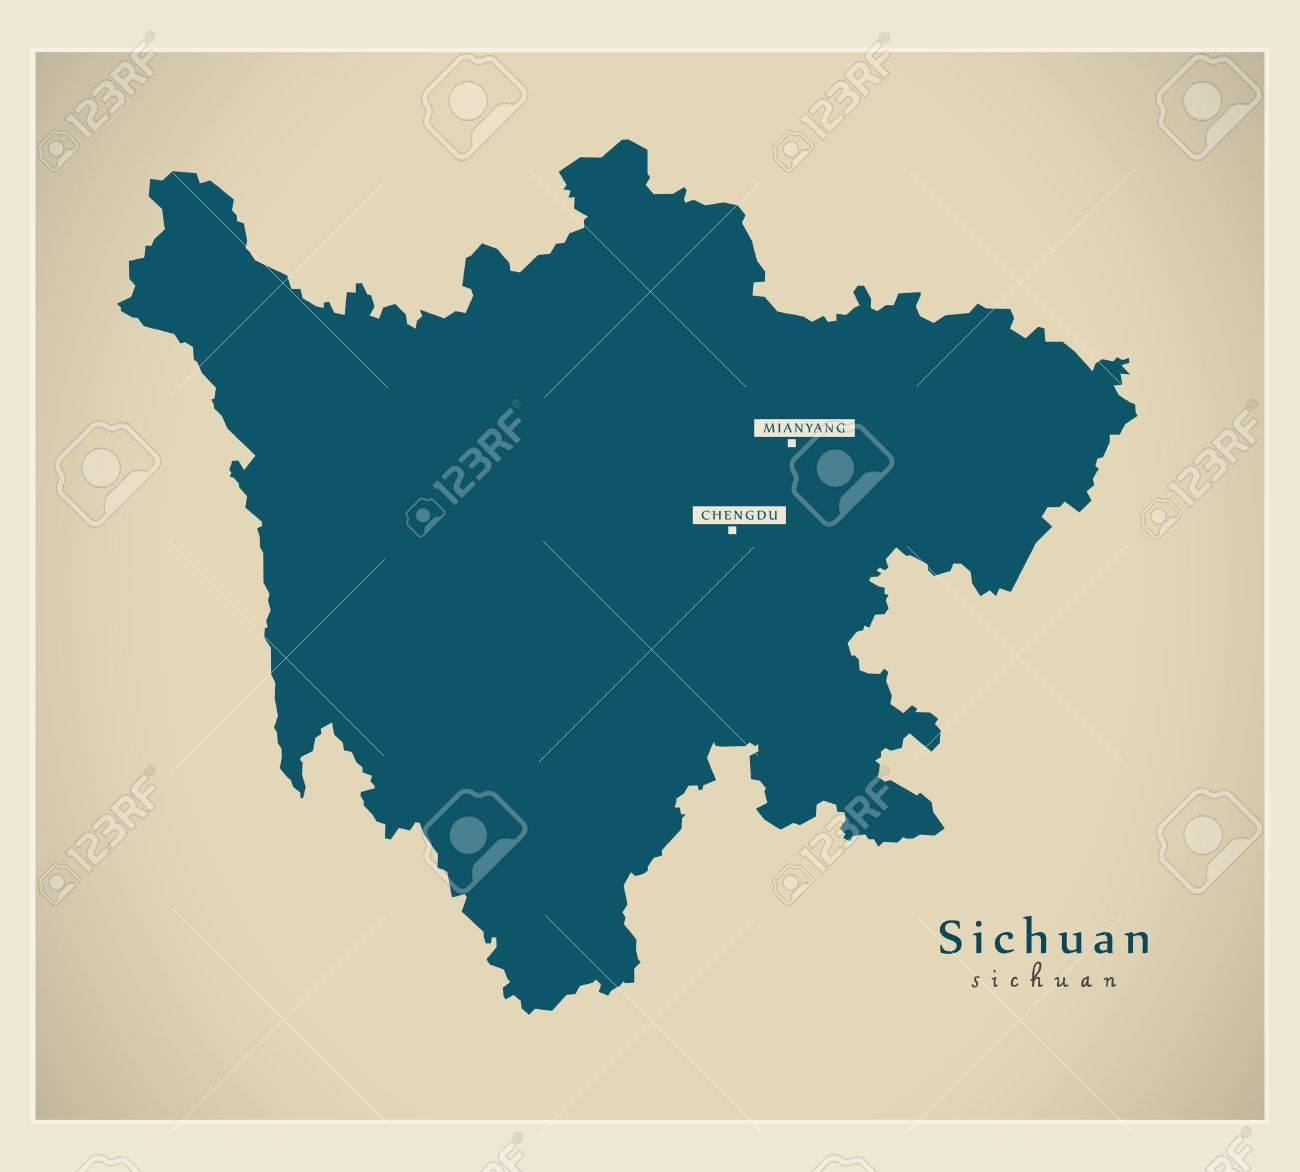 Modern Map - Sichuan CN region illustration silhouette - 73293057